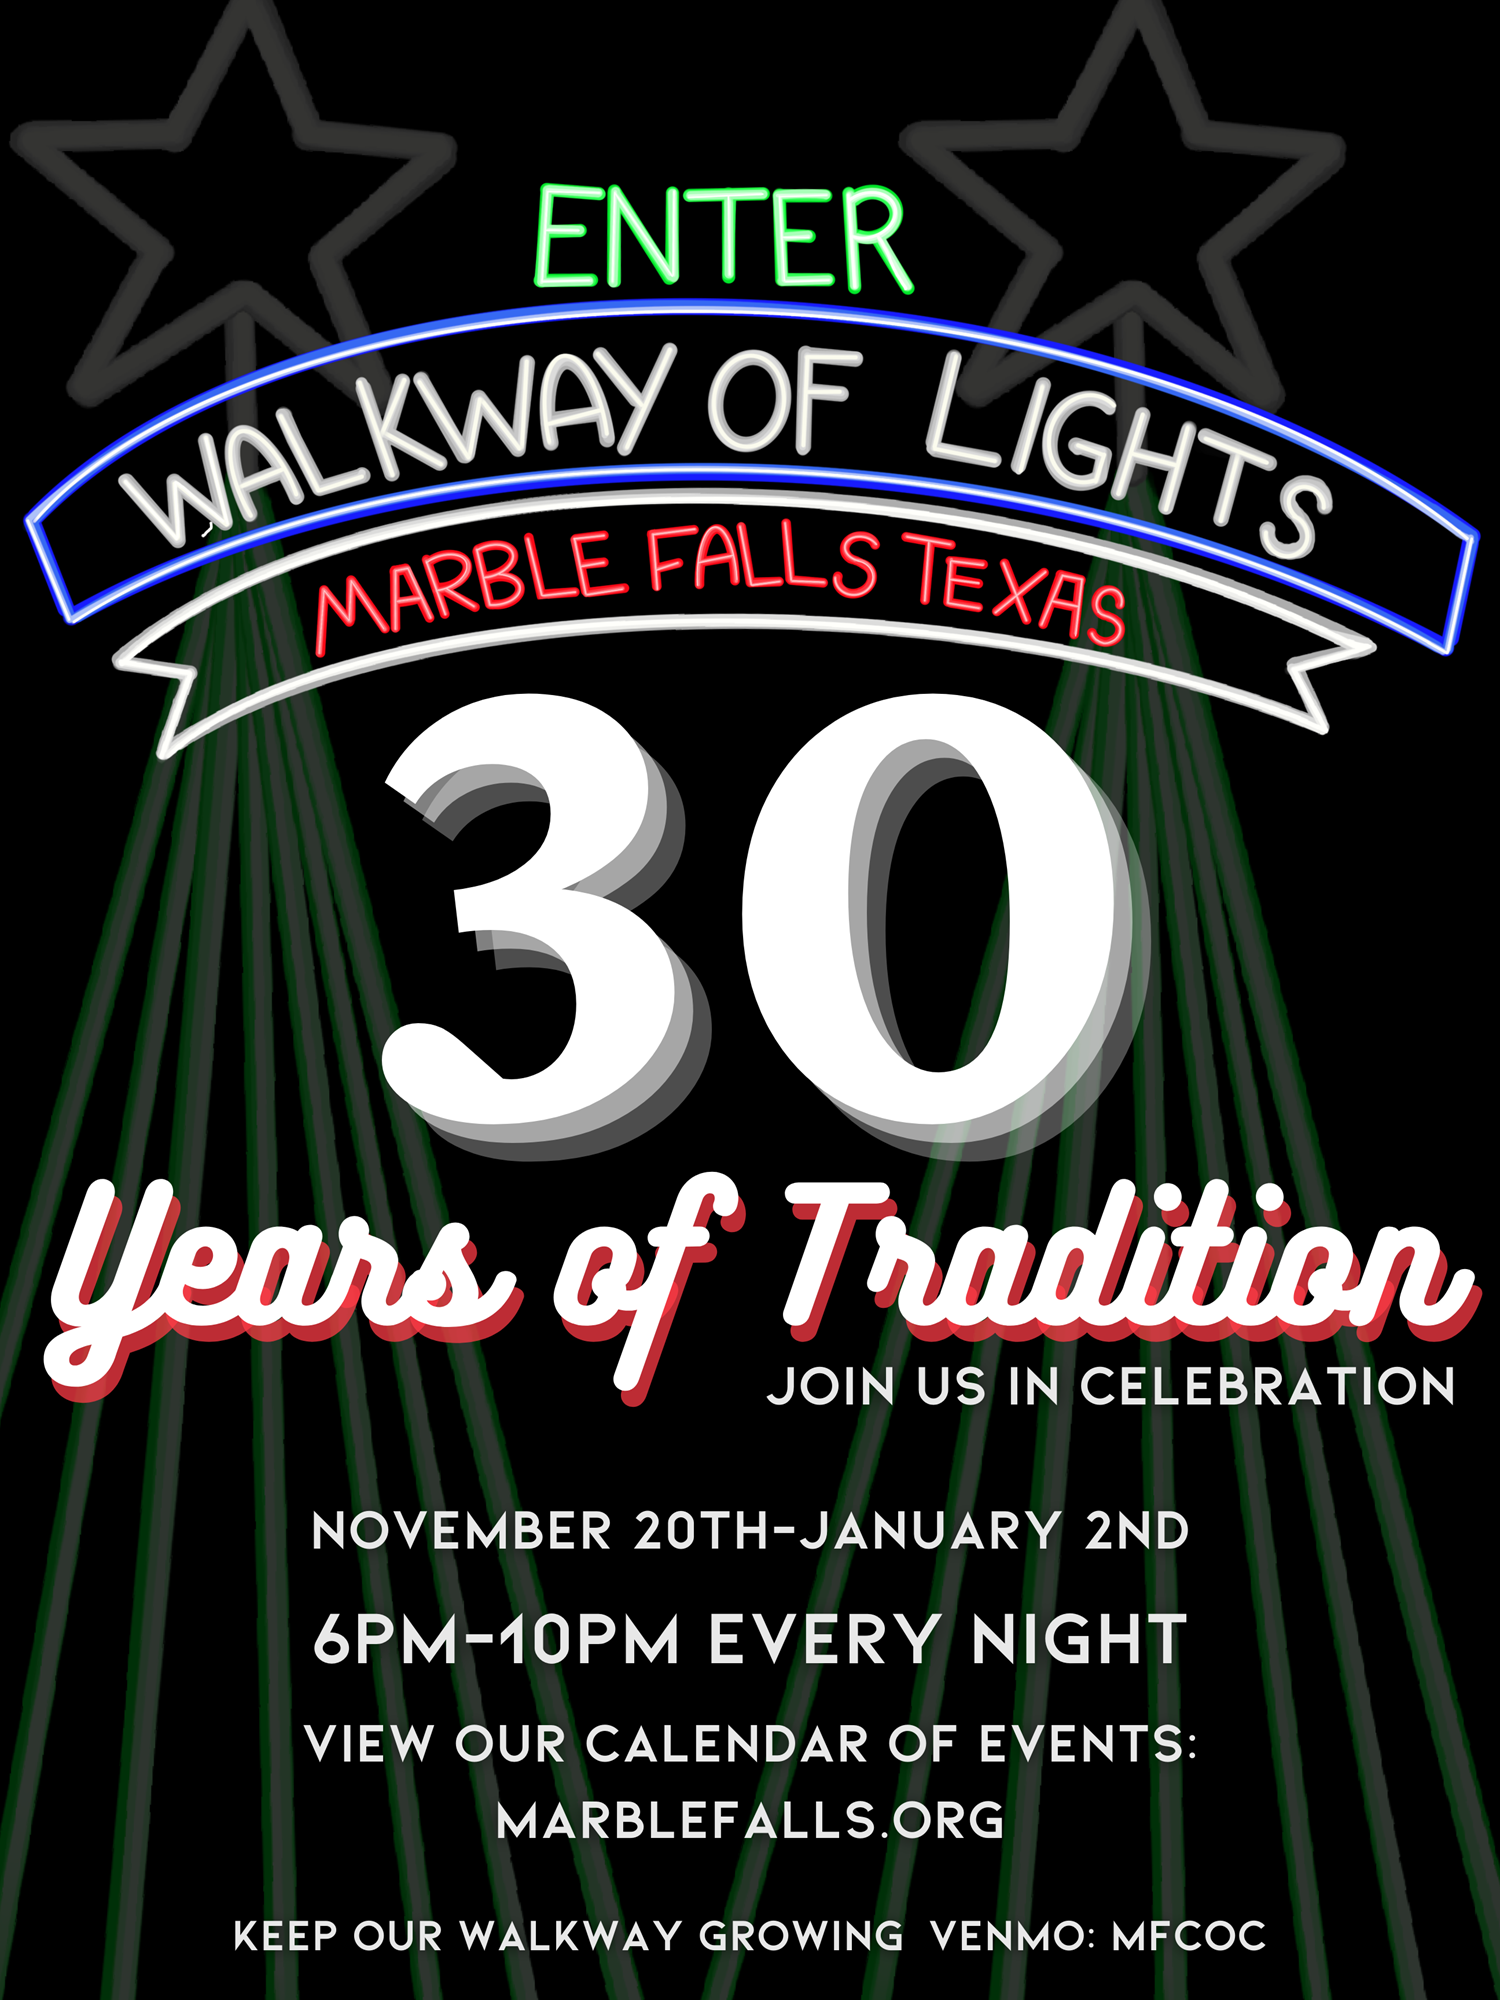 Marble Falls Christmas Lights 2020 The Walkway of Lights 2020